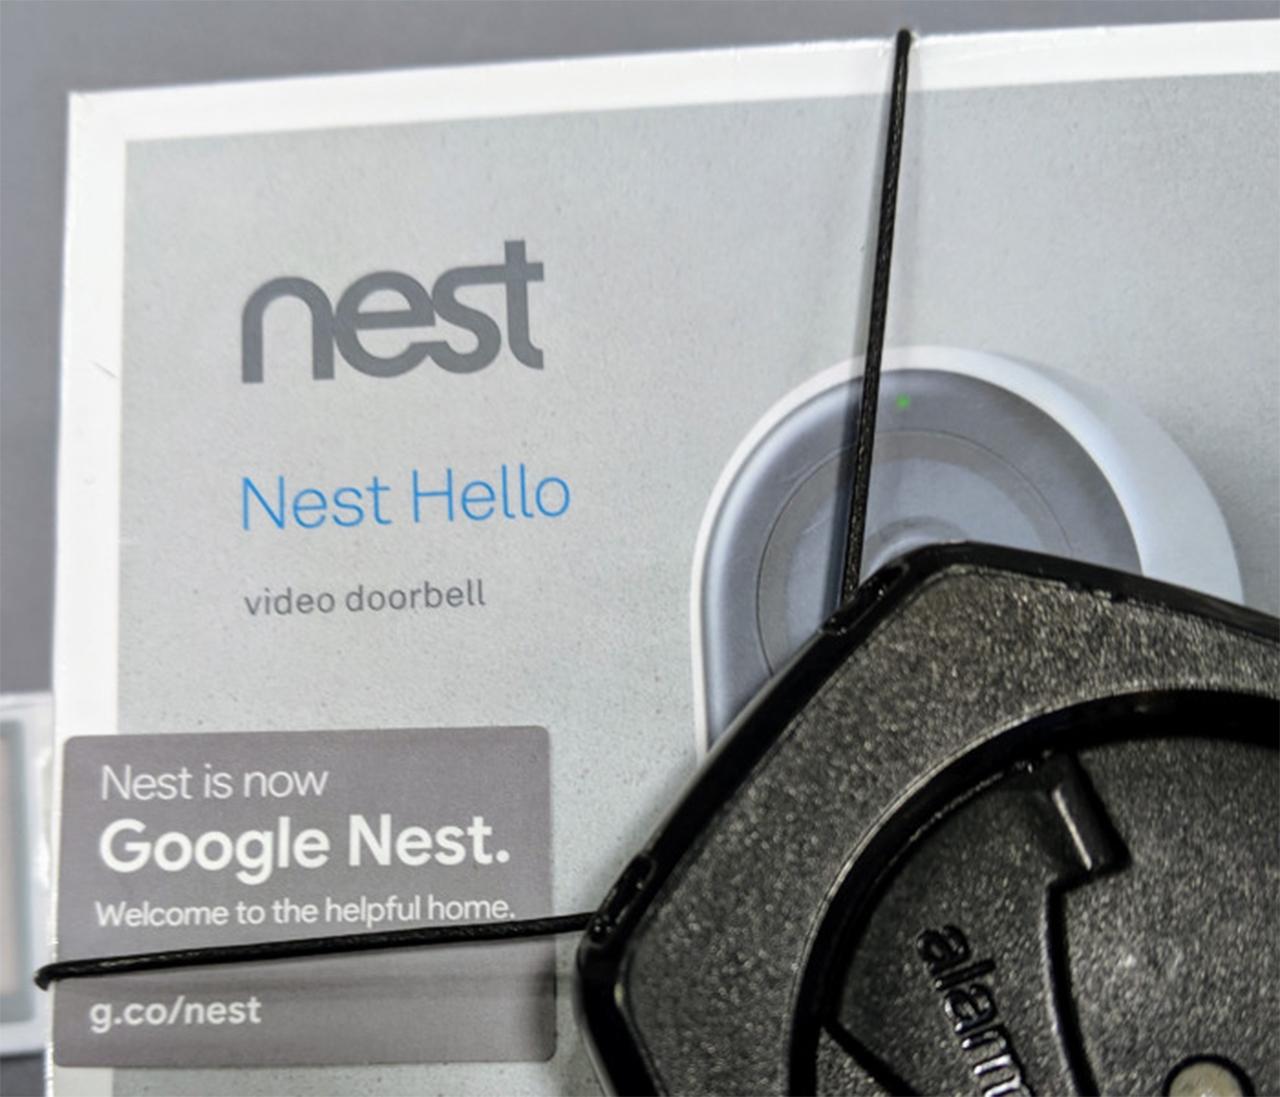 Nest Hello with Google Nest branding